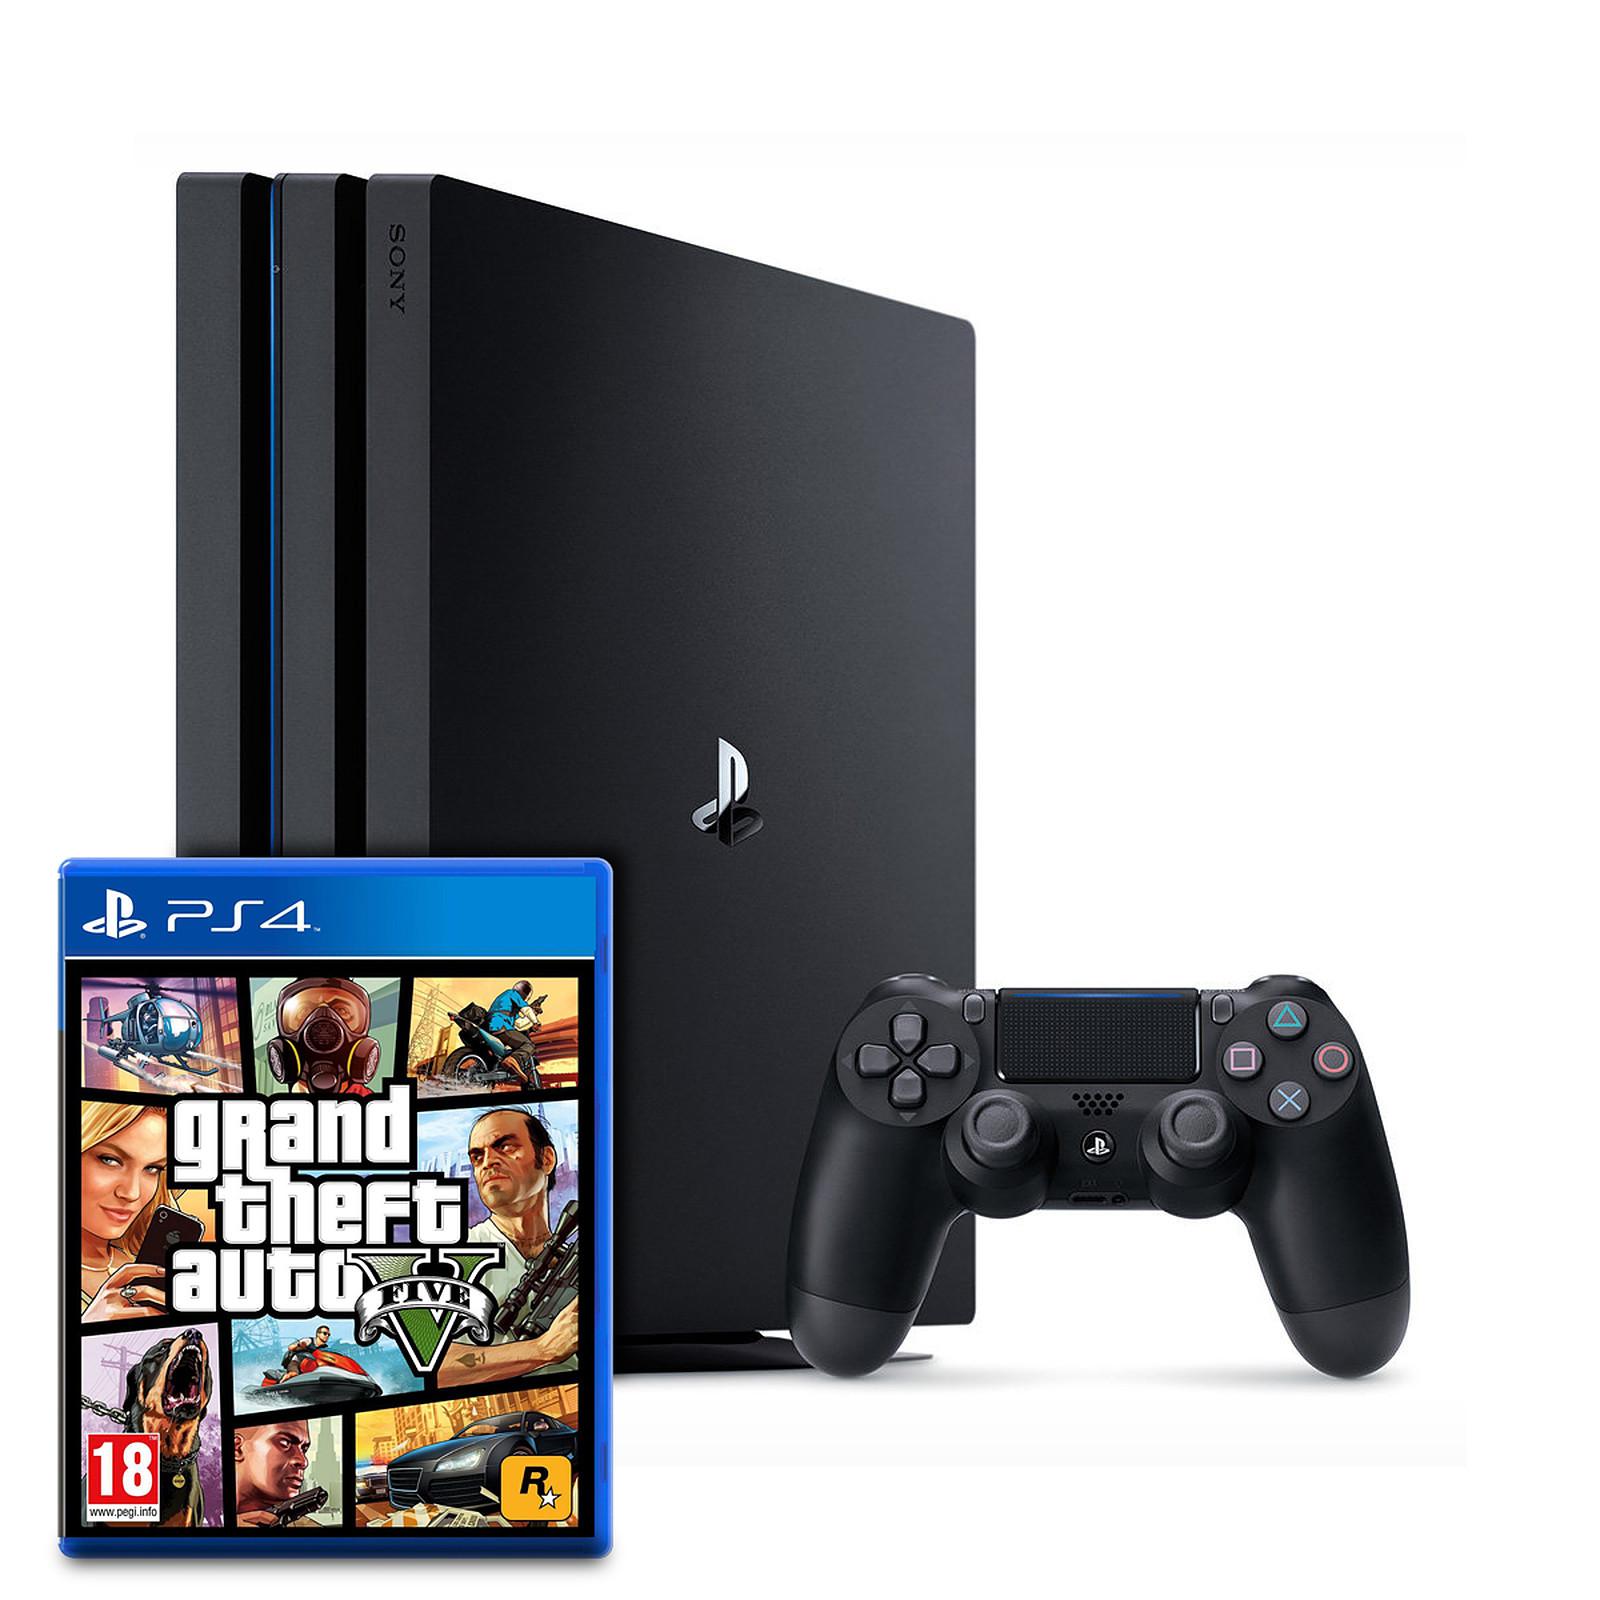 beafe1c87 Sony PlayStation 4 Pro (1 To) + Grand Theft Auto V - GTA 5 - Console ...